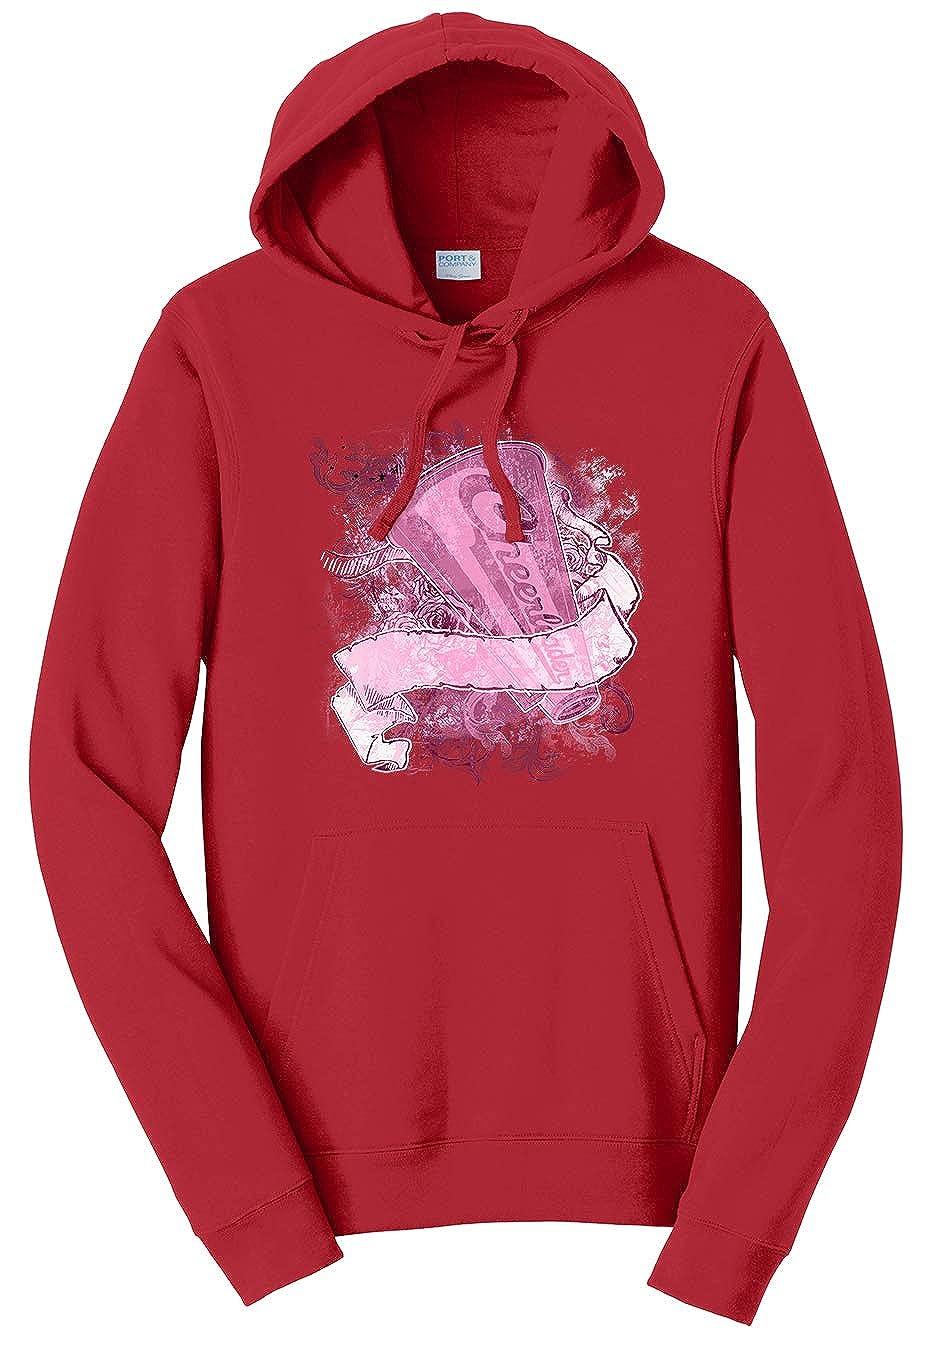 Tenacitee Unisex High Fashion Cheerleading Sweatshirt